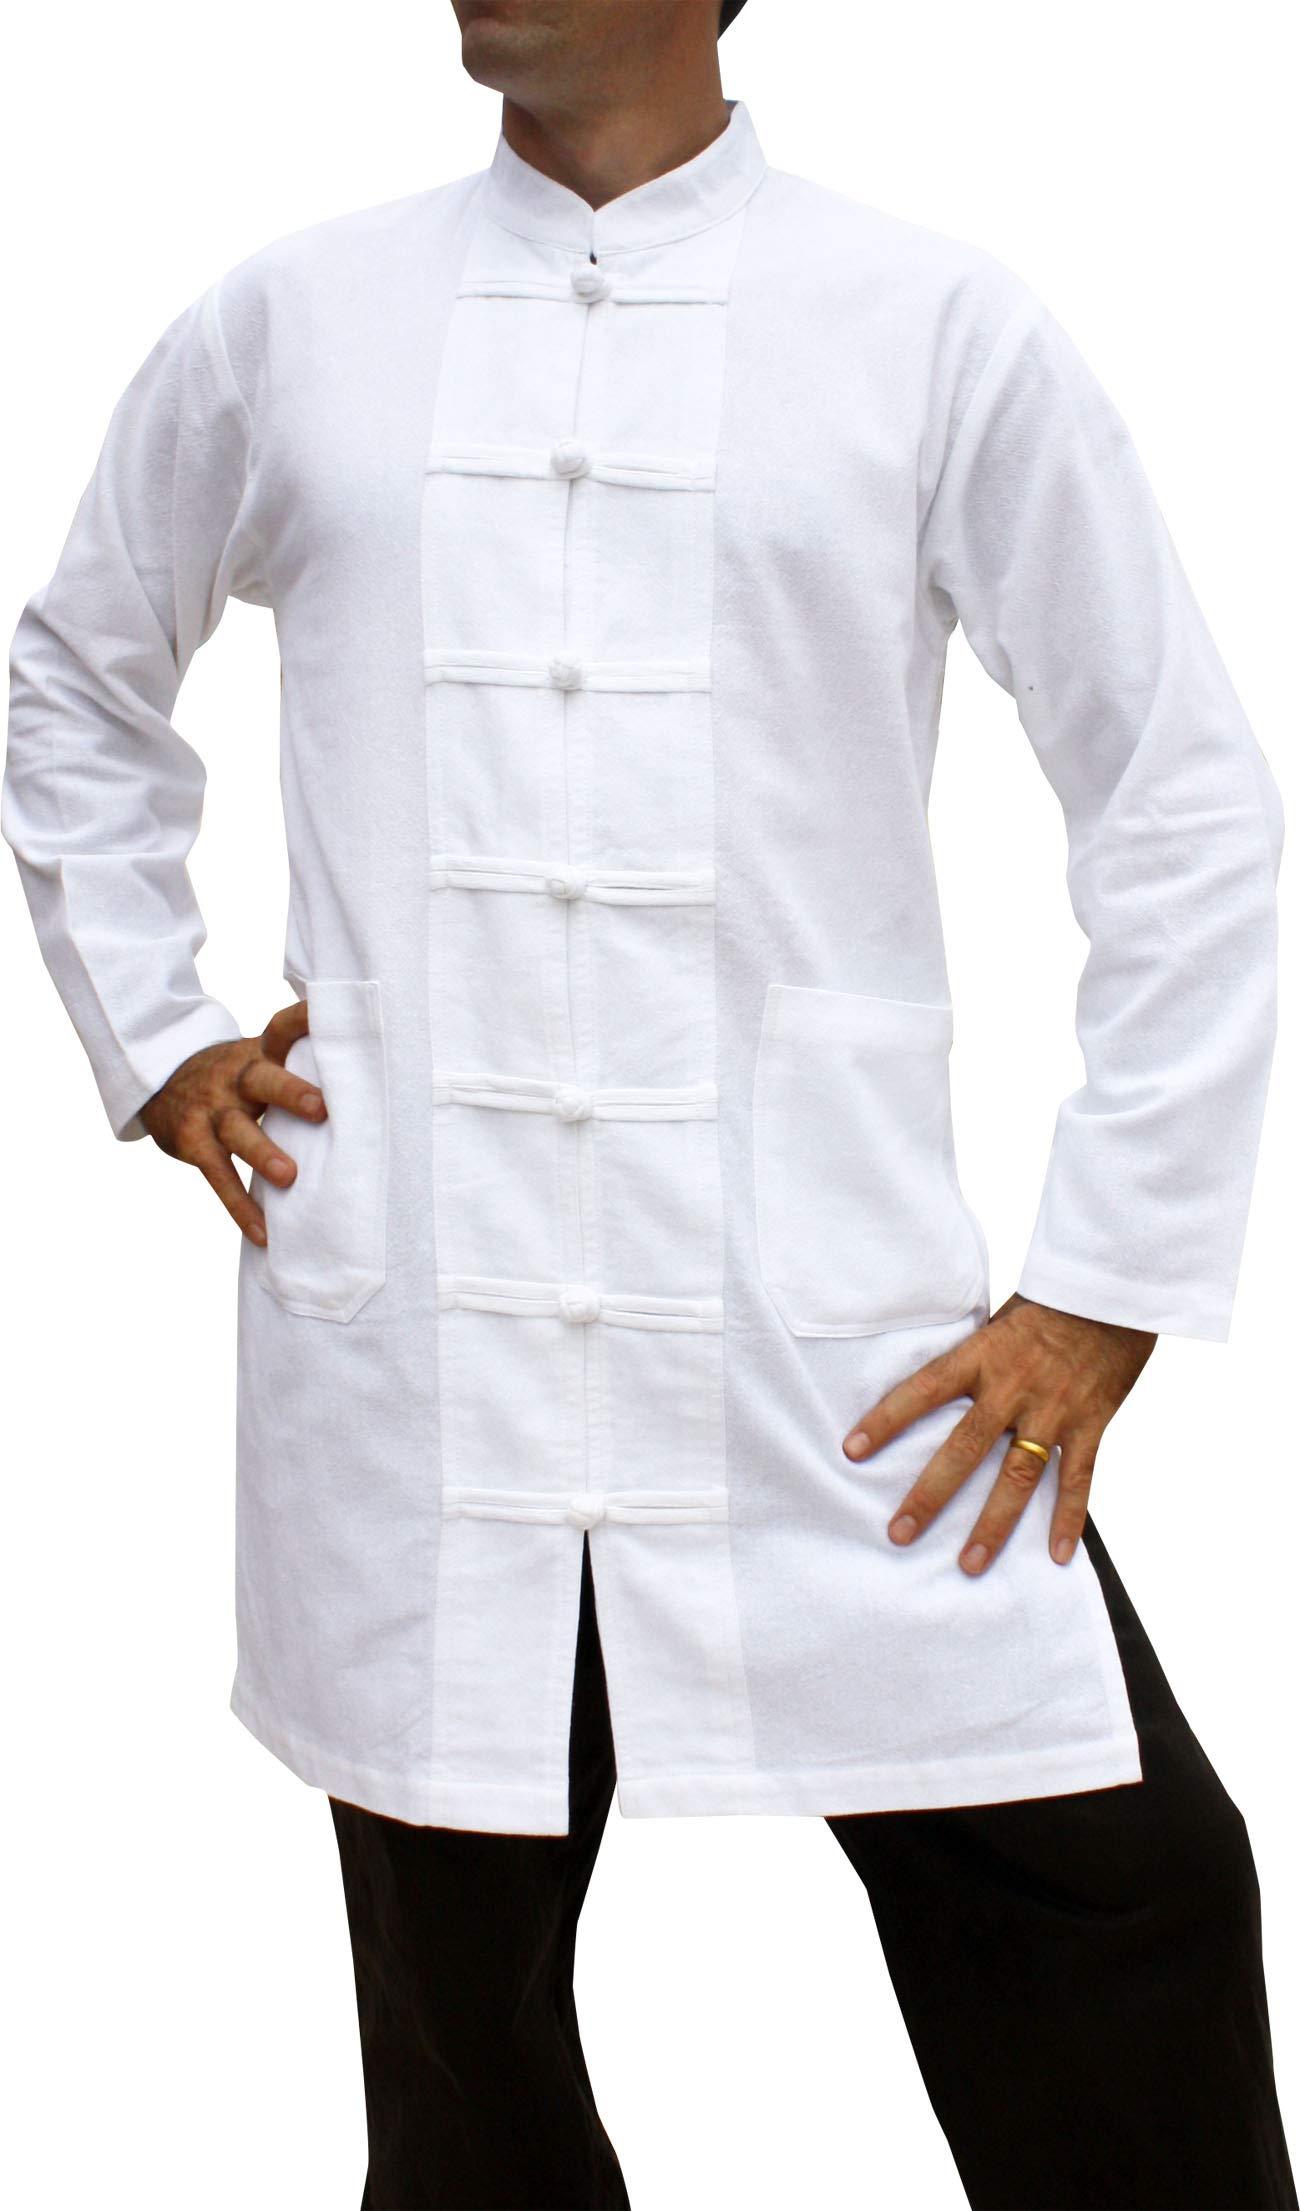 Svenine Long Chinese Jacket Handmade Kung Fu Tai Chi Shirt with Waist Pockets, XXX-Large, Muang Cotton - White